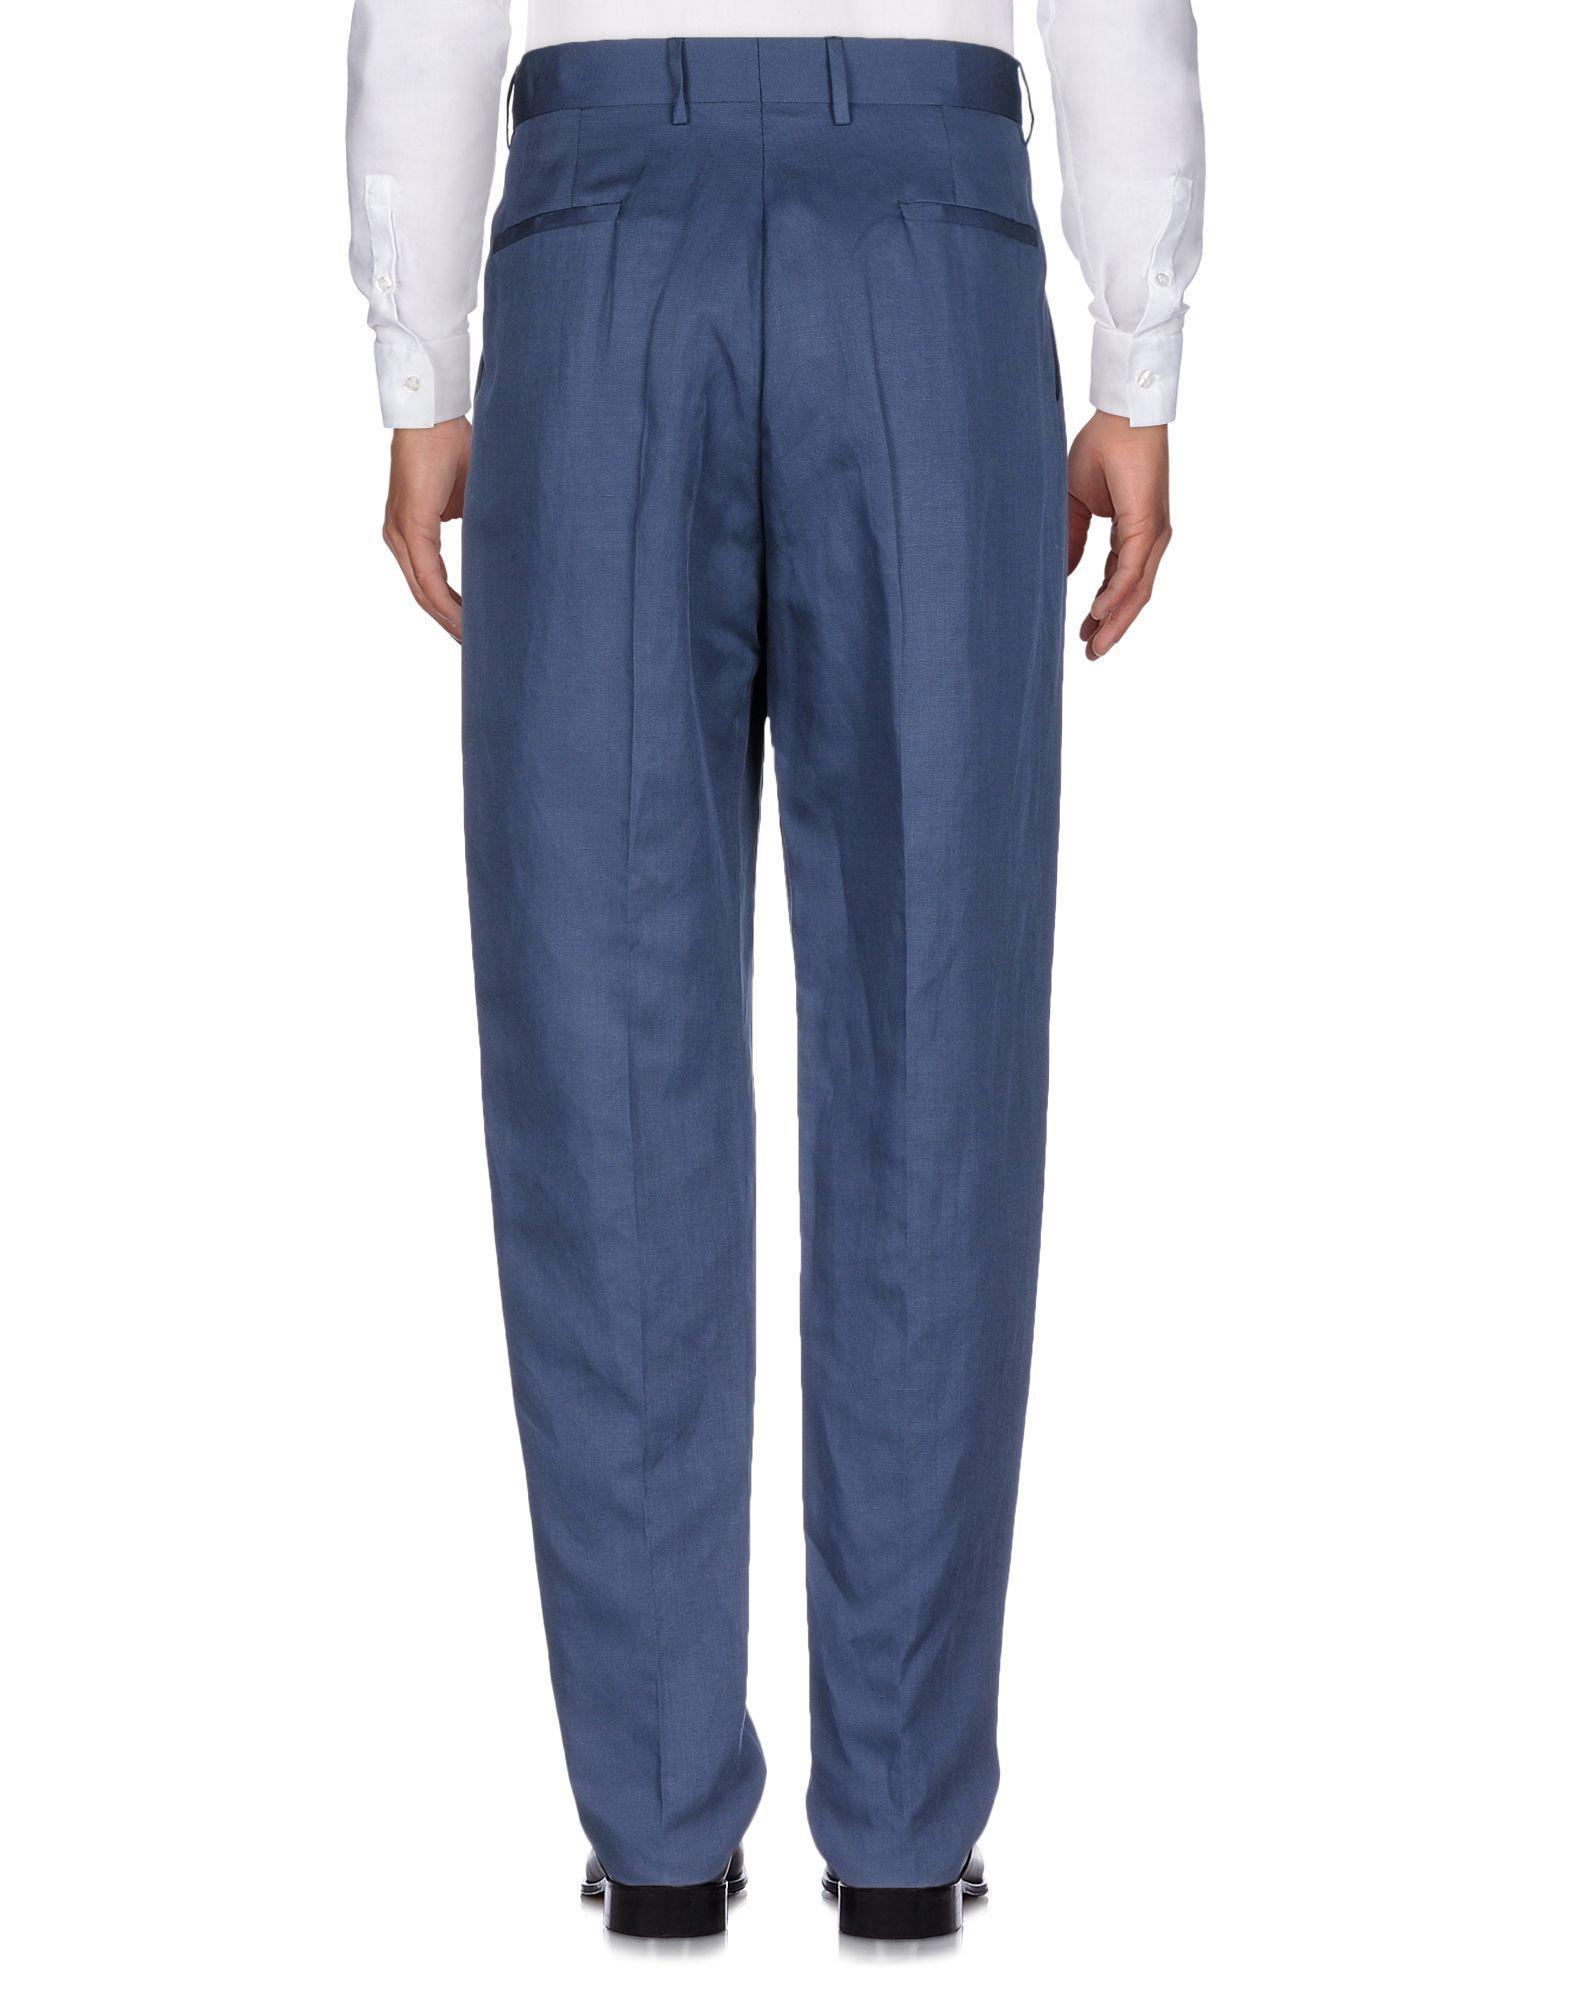 Umit Benan Linen Casual Pants in Dark Blue (Blue) for Men